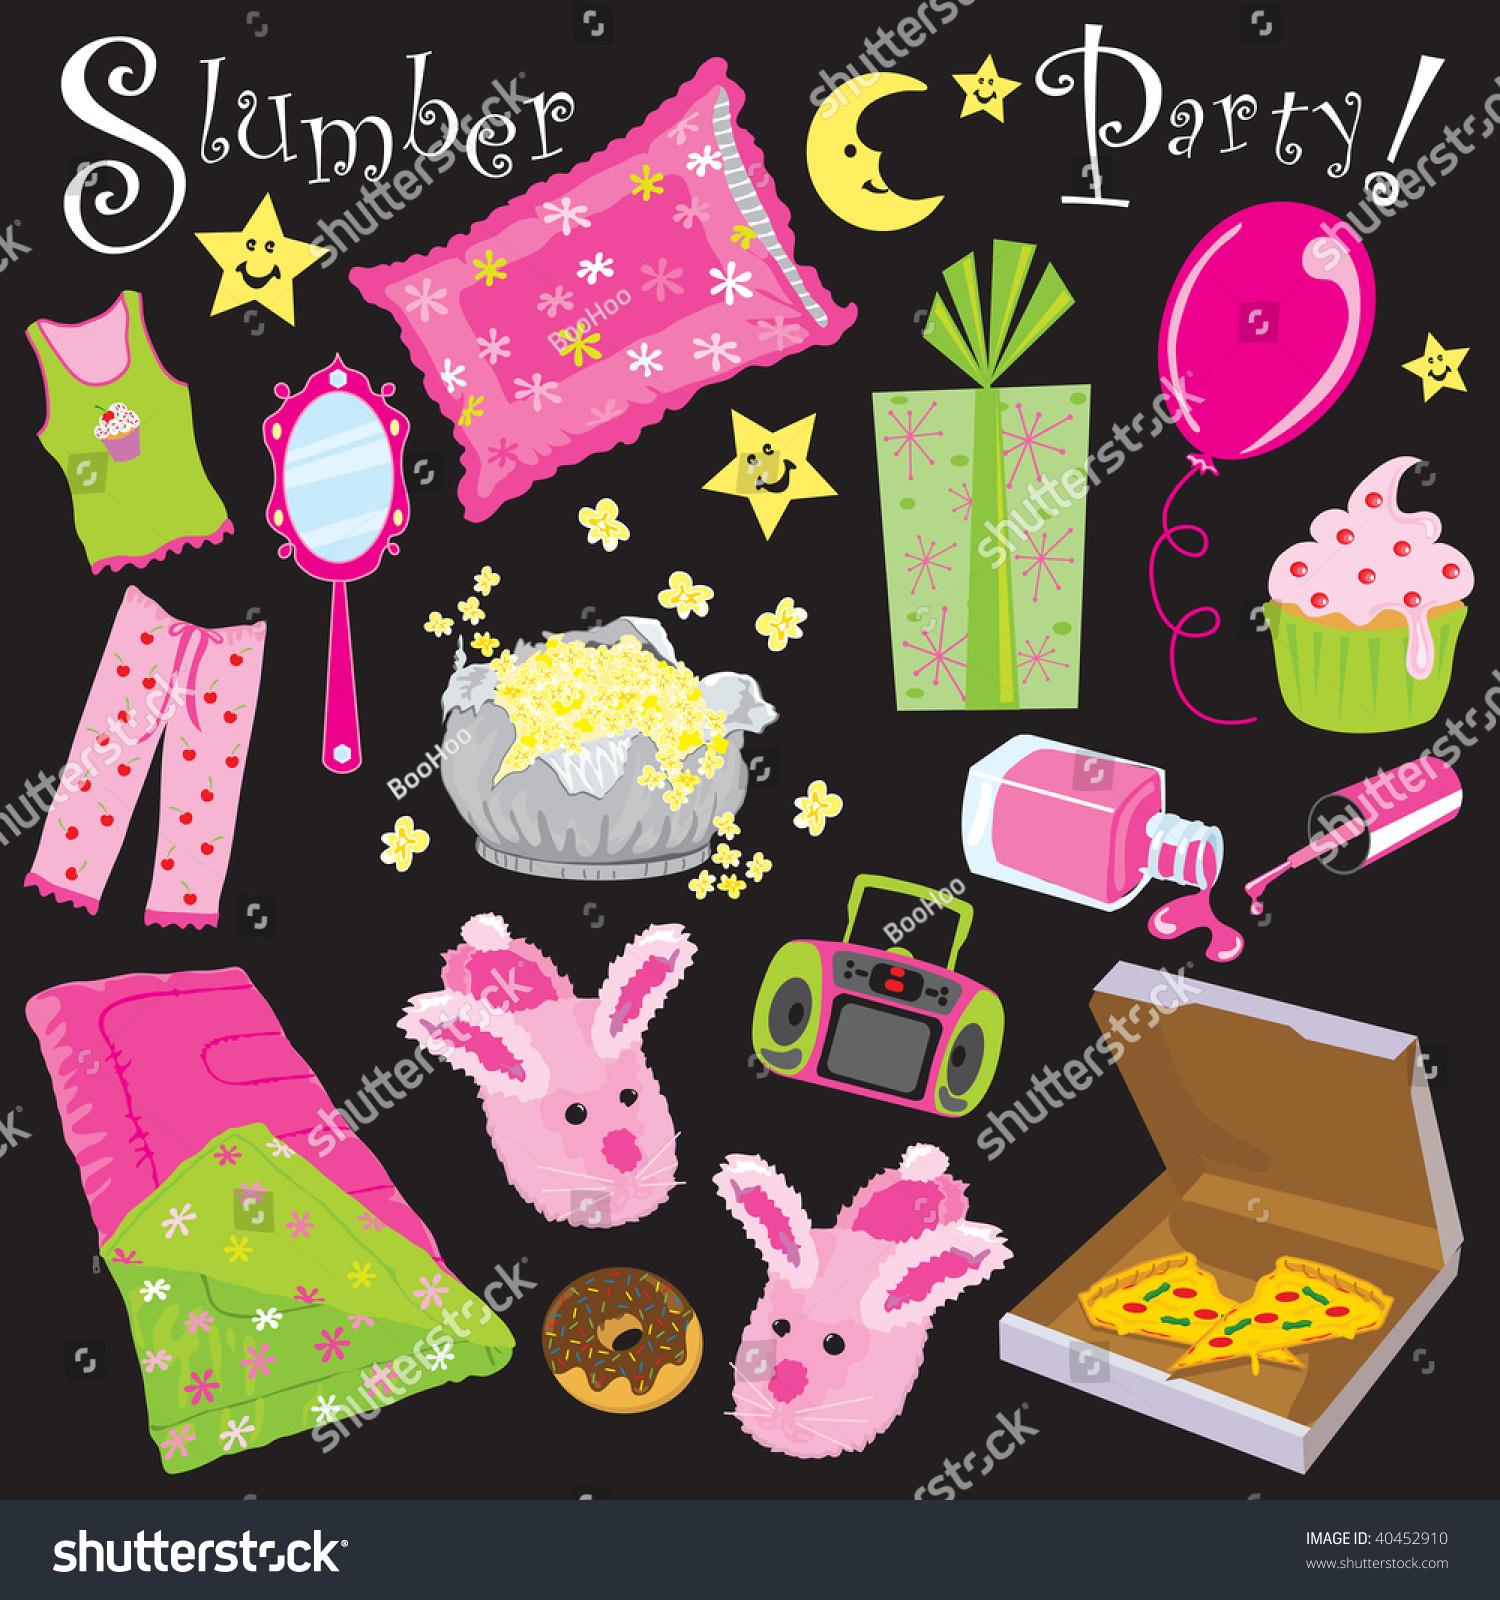 Slumber Birthday Party Invitation Clipart Stock Photo